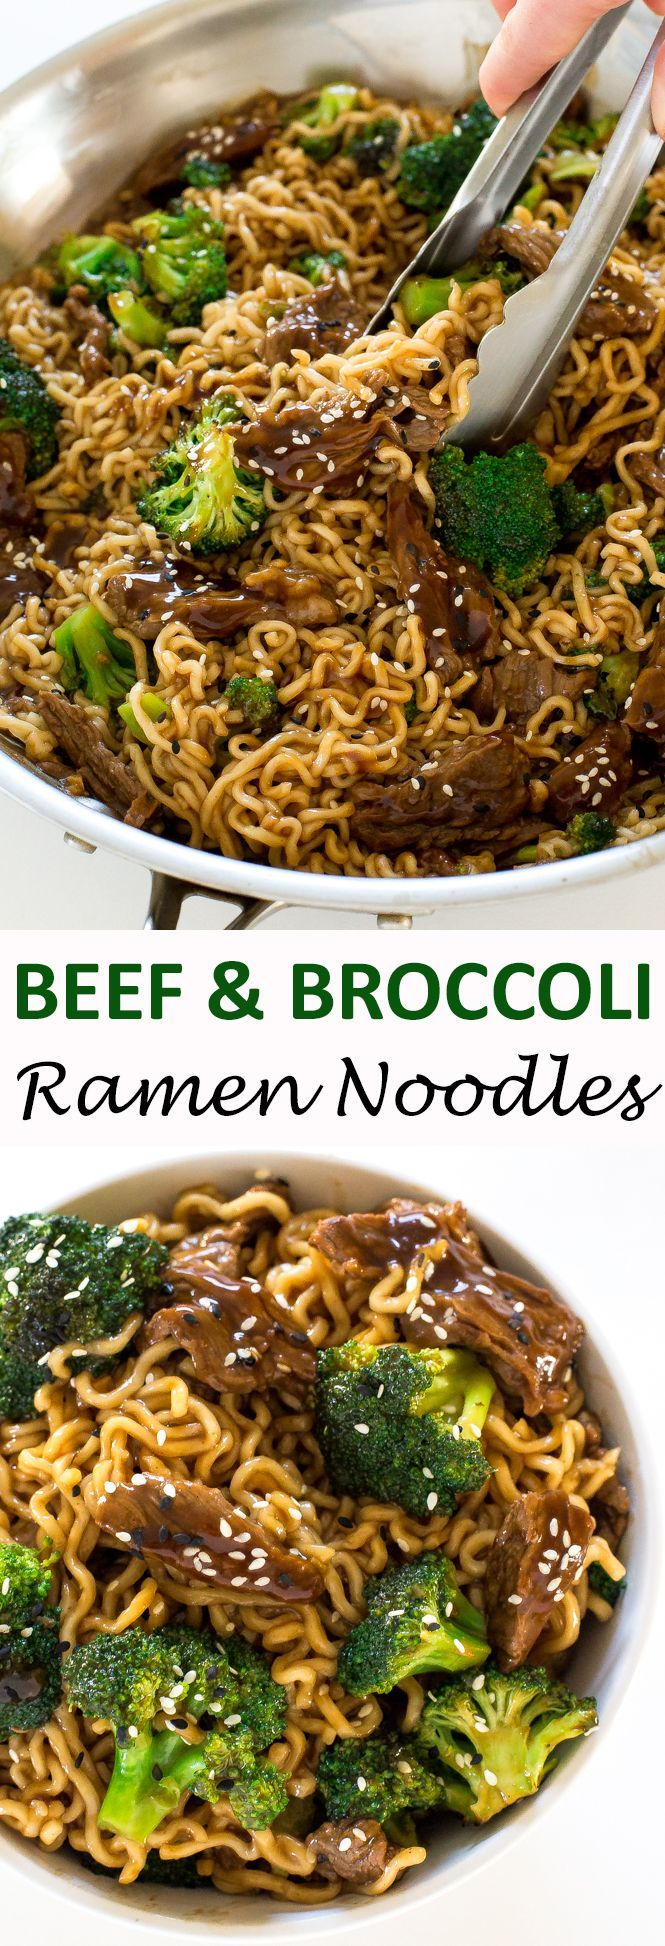 One Skillet Beef and Broccoli Ramen Add 1/4 hoisin sauce, 1 tsp siracha, 1 beef ramen packet, 1 extra tbsp brown sugar